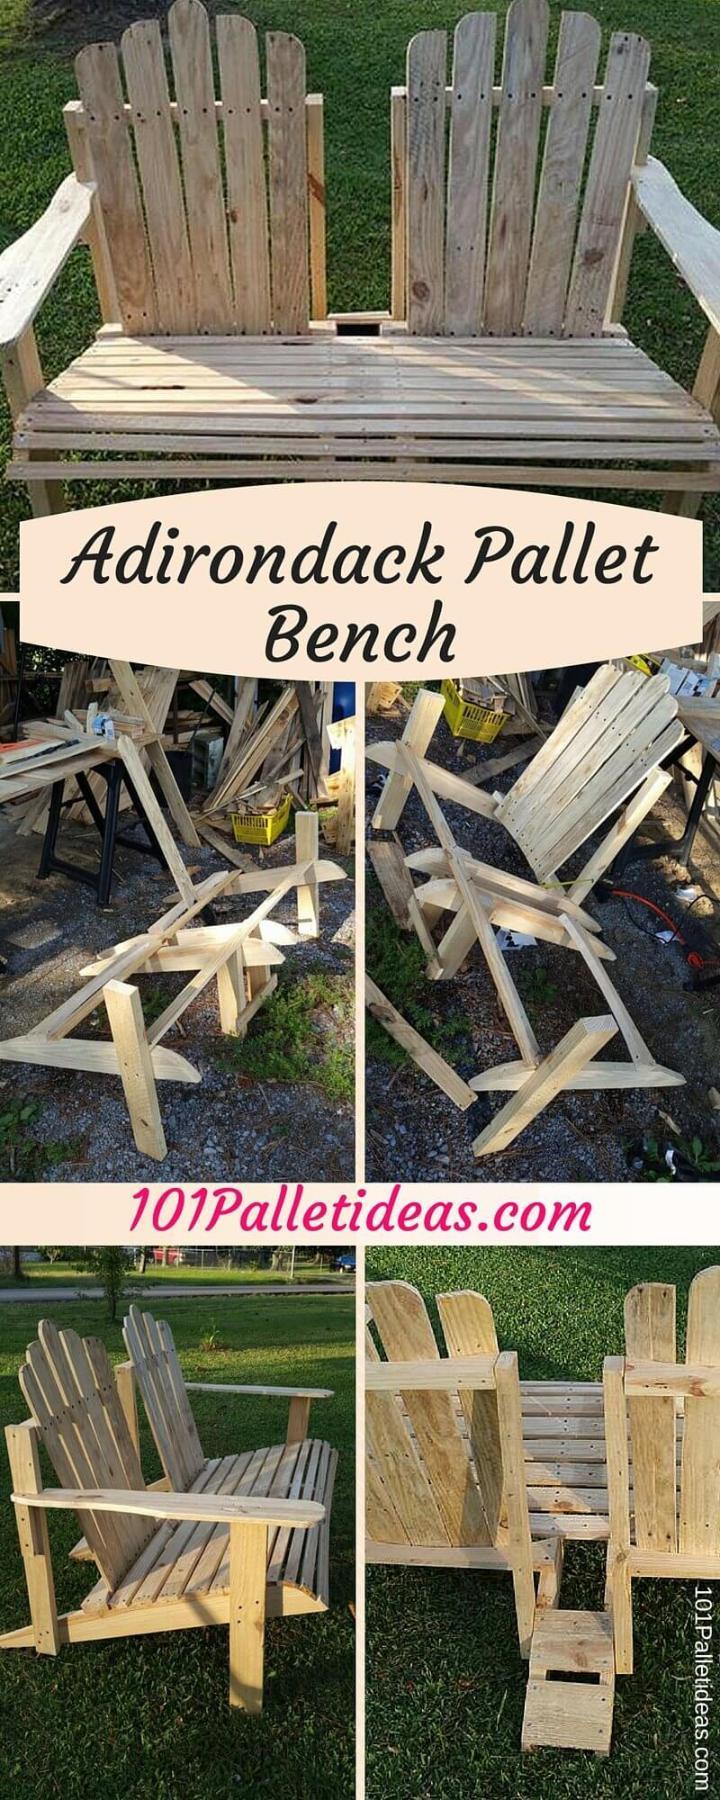 Adirondack Pallet Bench